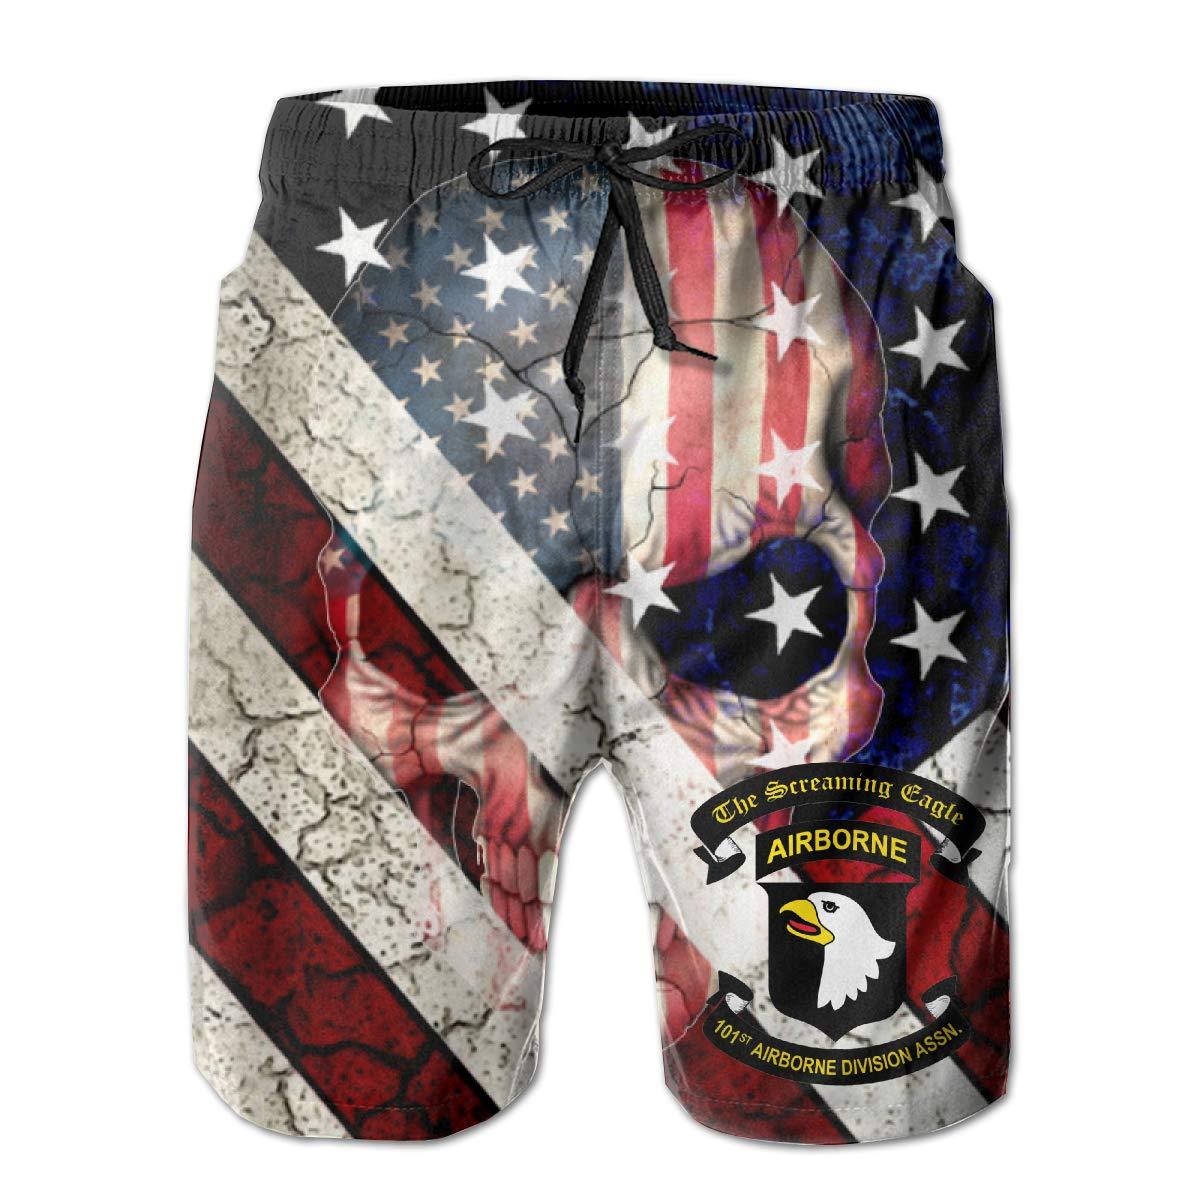 CCNXFGOK 101st Airborne Division Association Boardshorts Mens Swimtrunks Fashion Beach Shorts Casual Shorts Swim Trunks